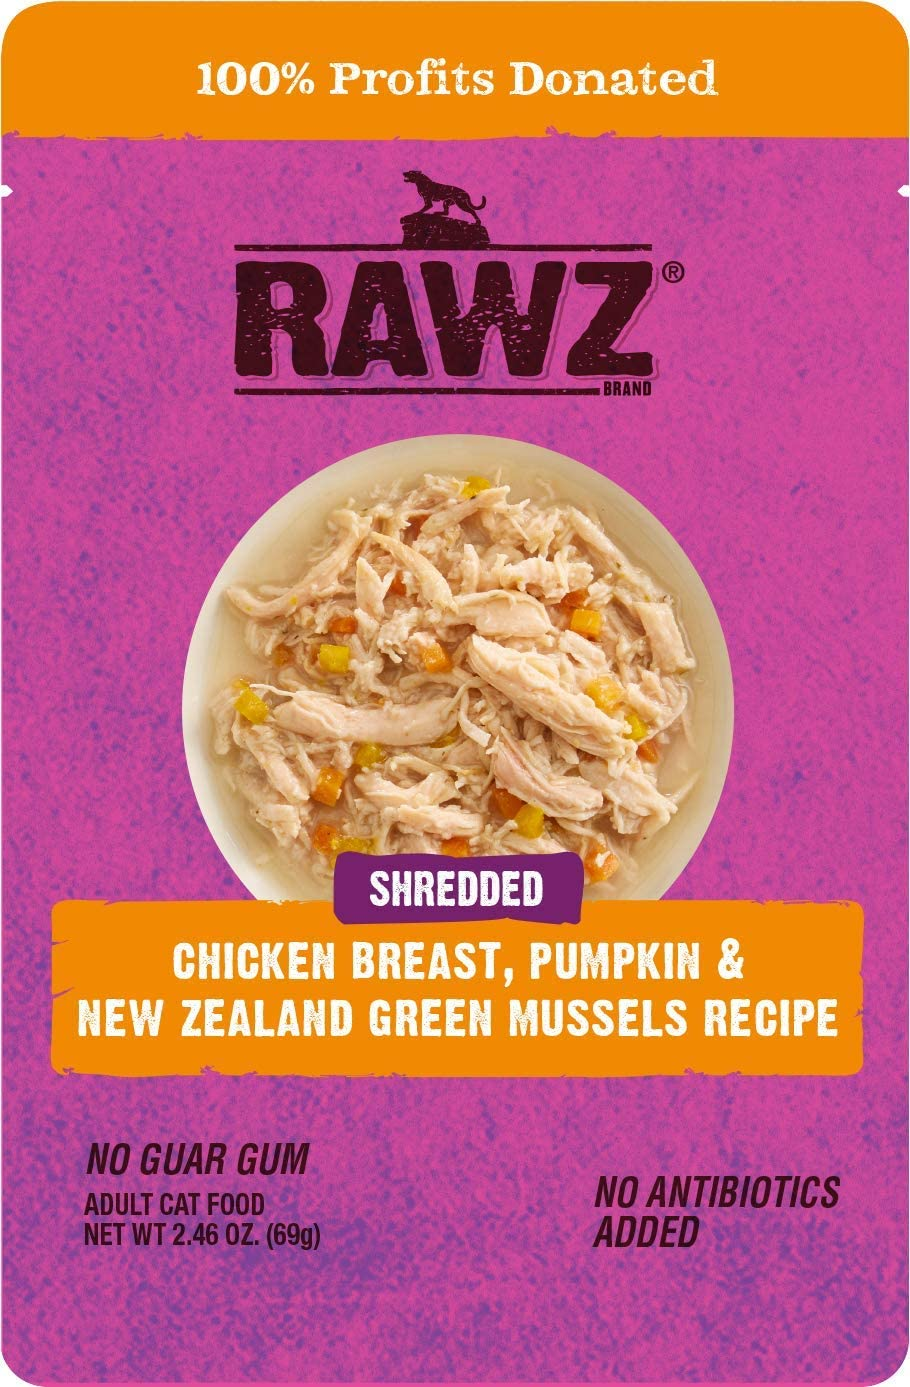 Rawz Shredded Chicken Breast, Pumpkin & New Zealand Green Mussels Recipe 8/2.46 oz Pouches